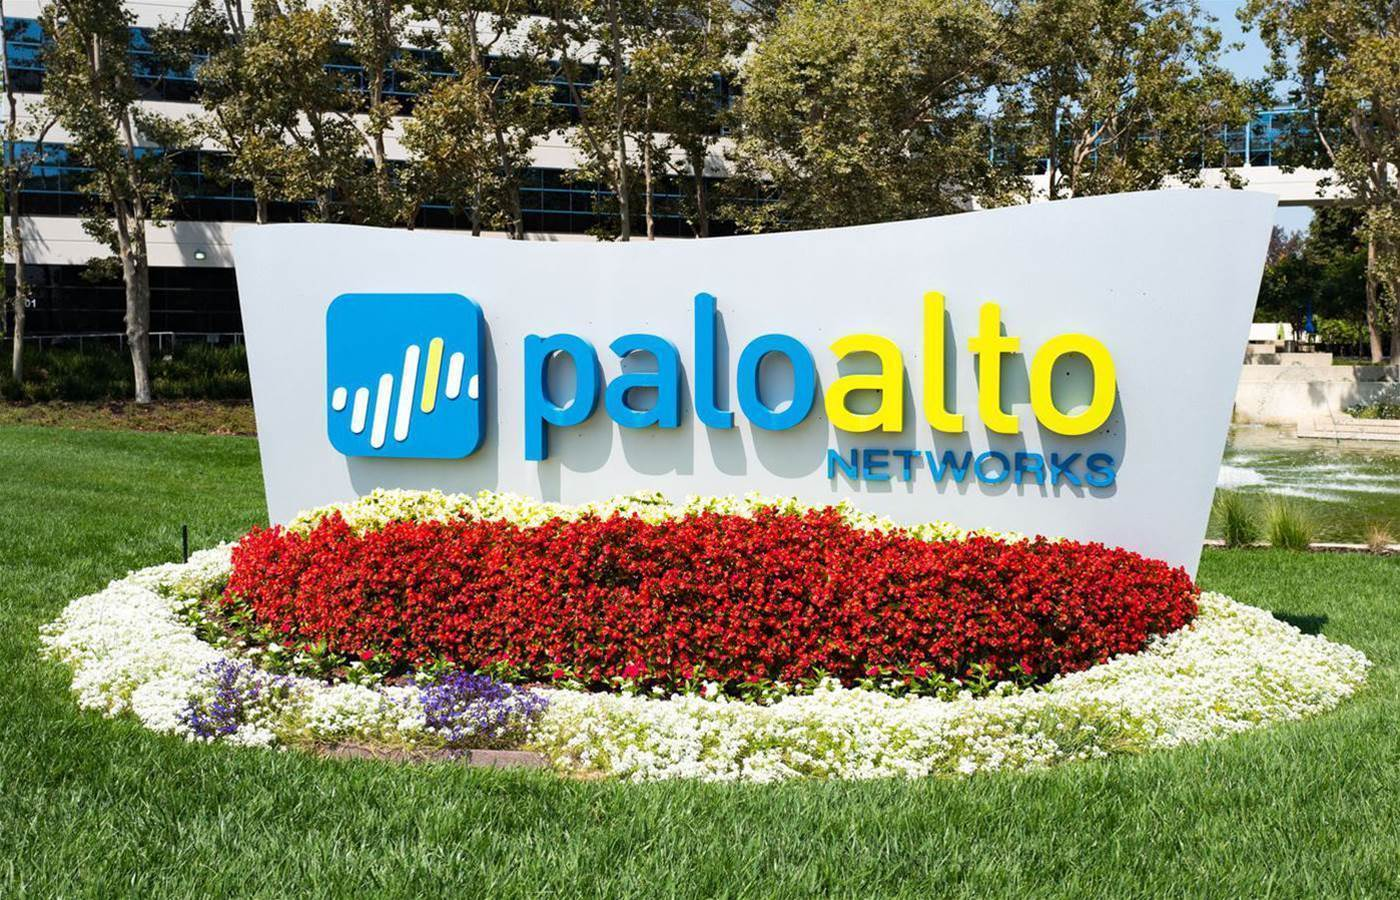 Palo Alto Networks to acquire cybersecurity startup Demisto